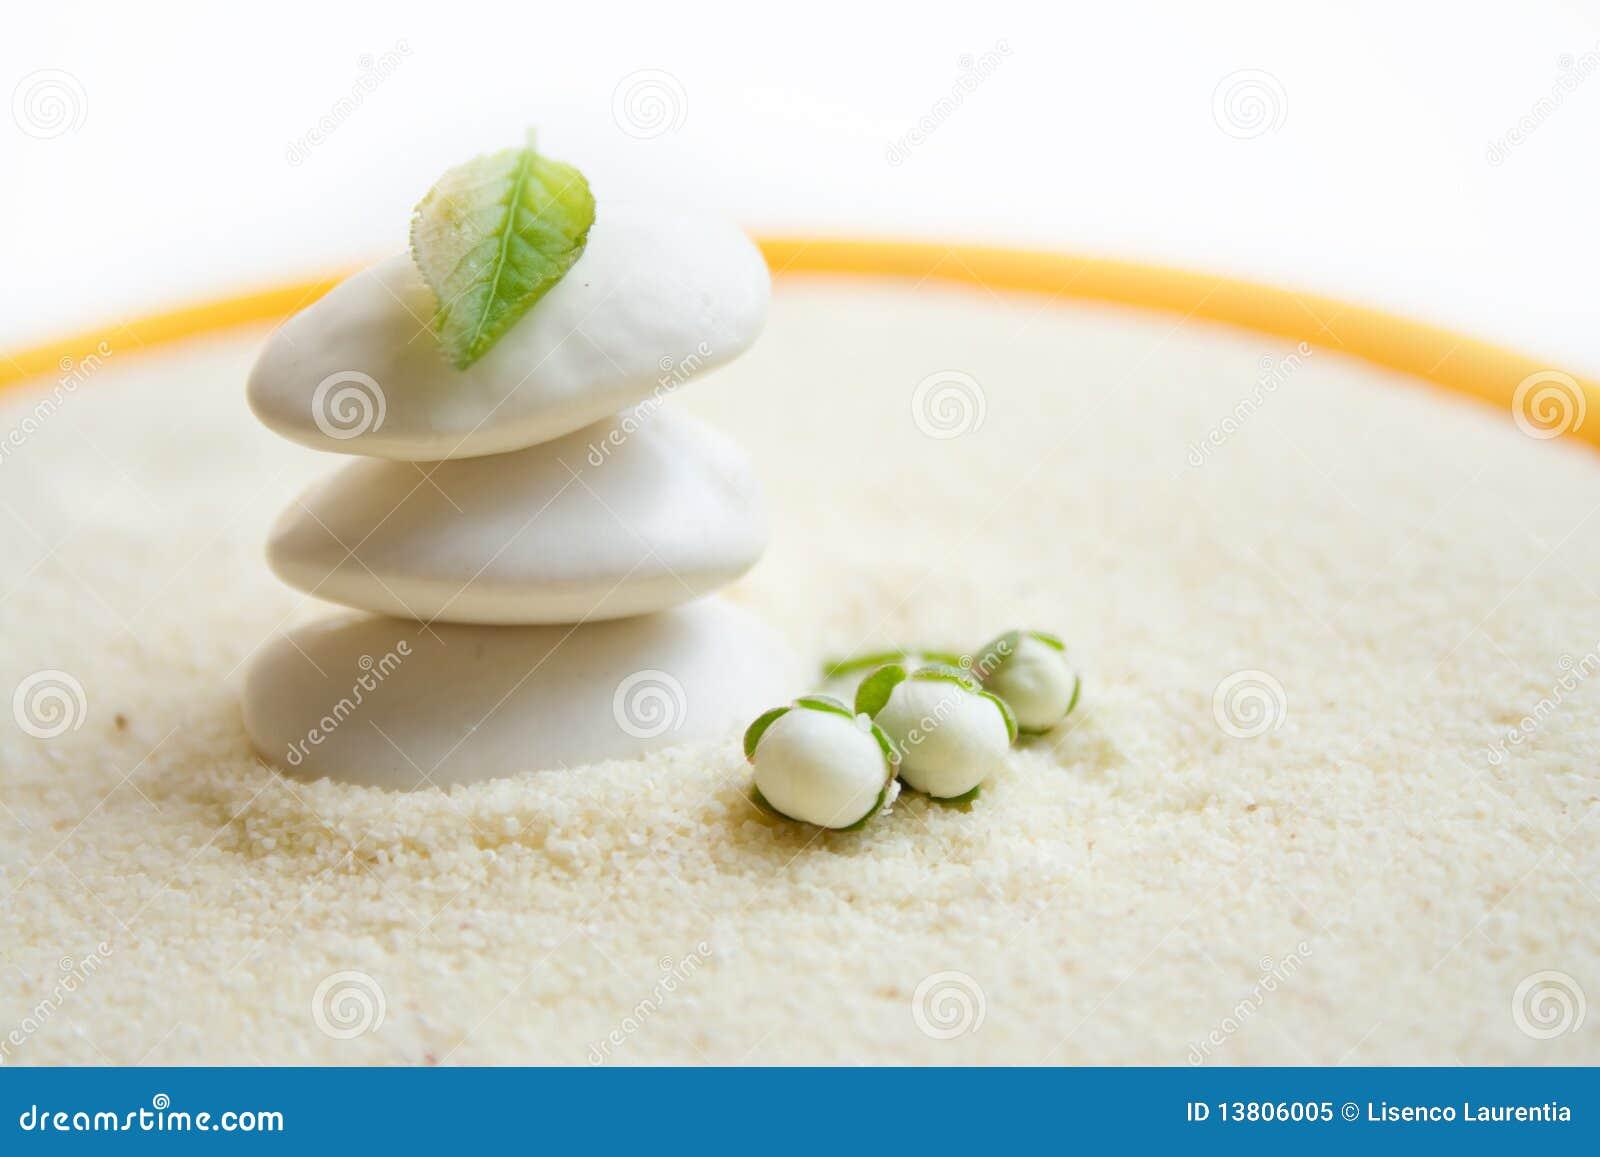 The Zen Peace Royalty Free Stock Photo Image 13806005